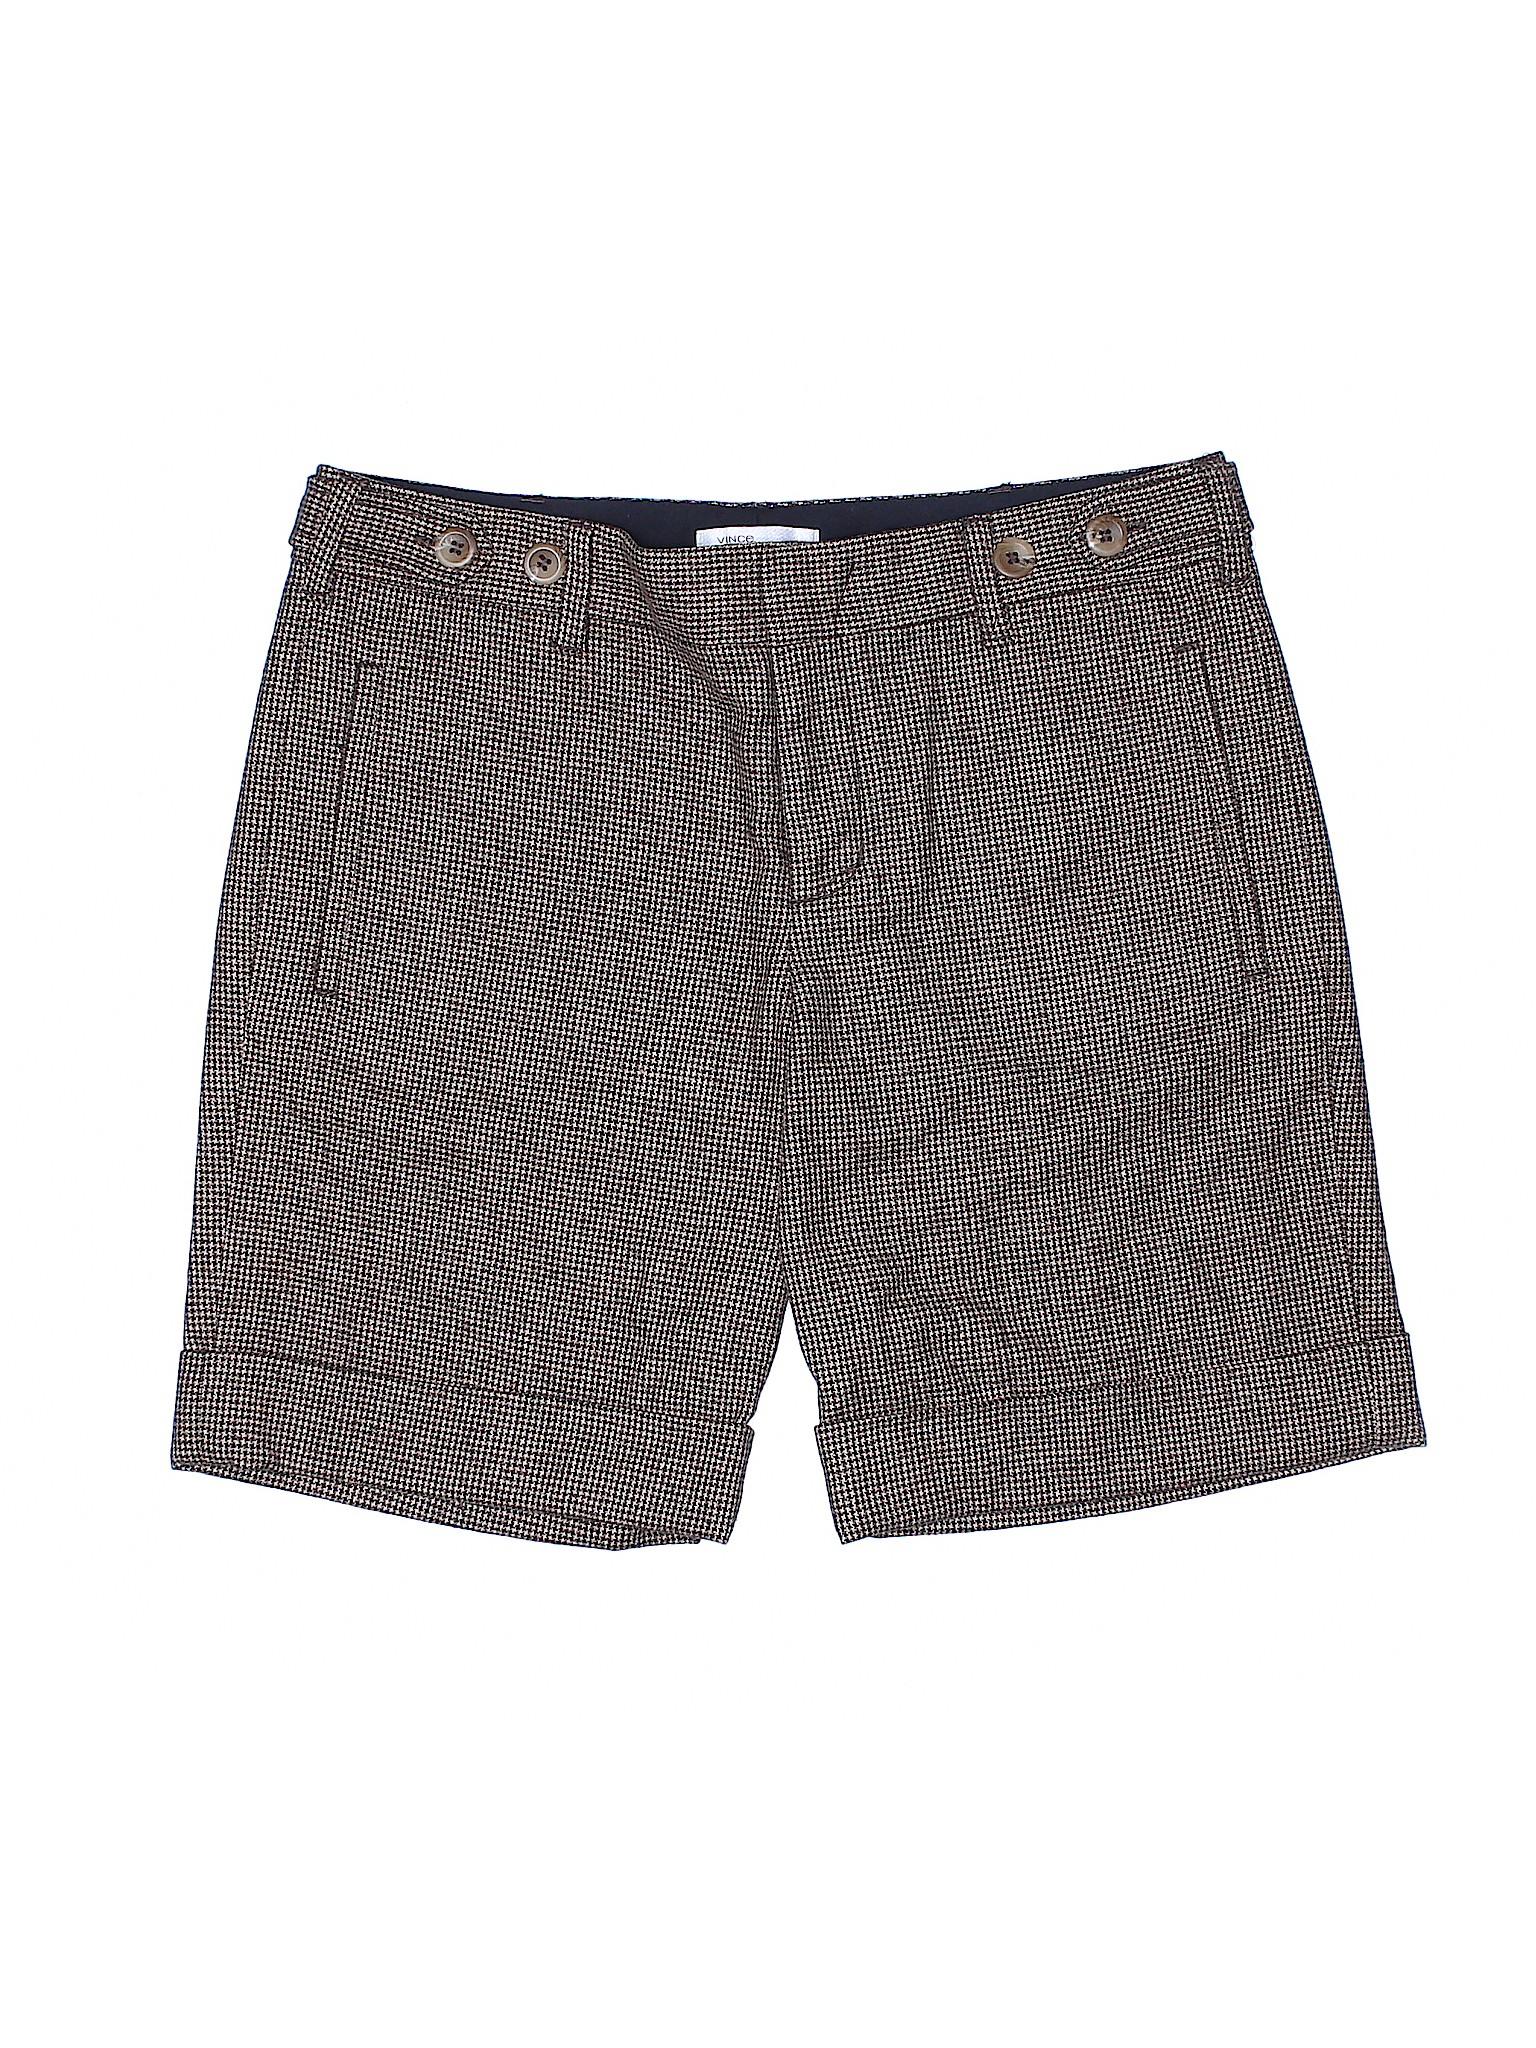 Boutique Boutique winter Shorts Vince winter Dressy Pq5qB